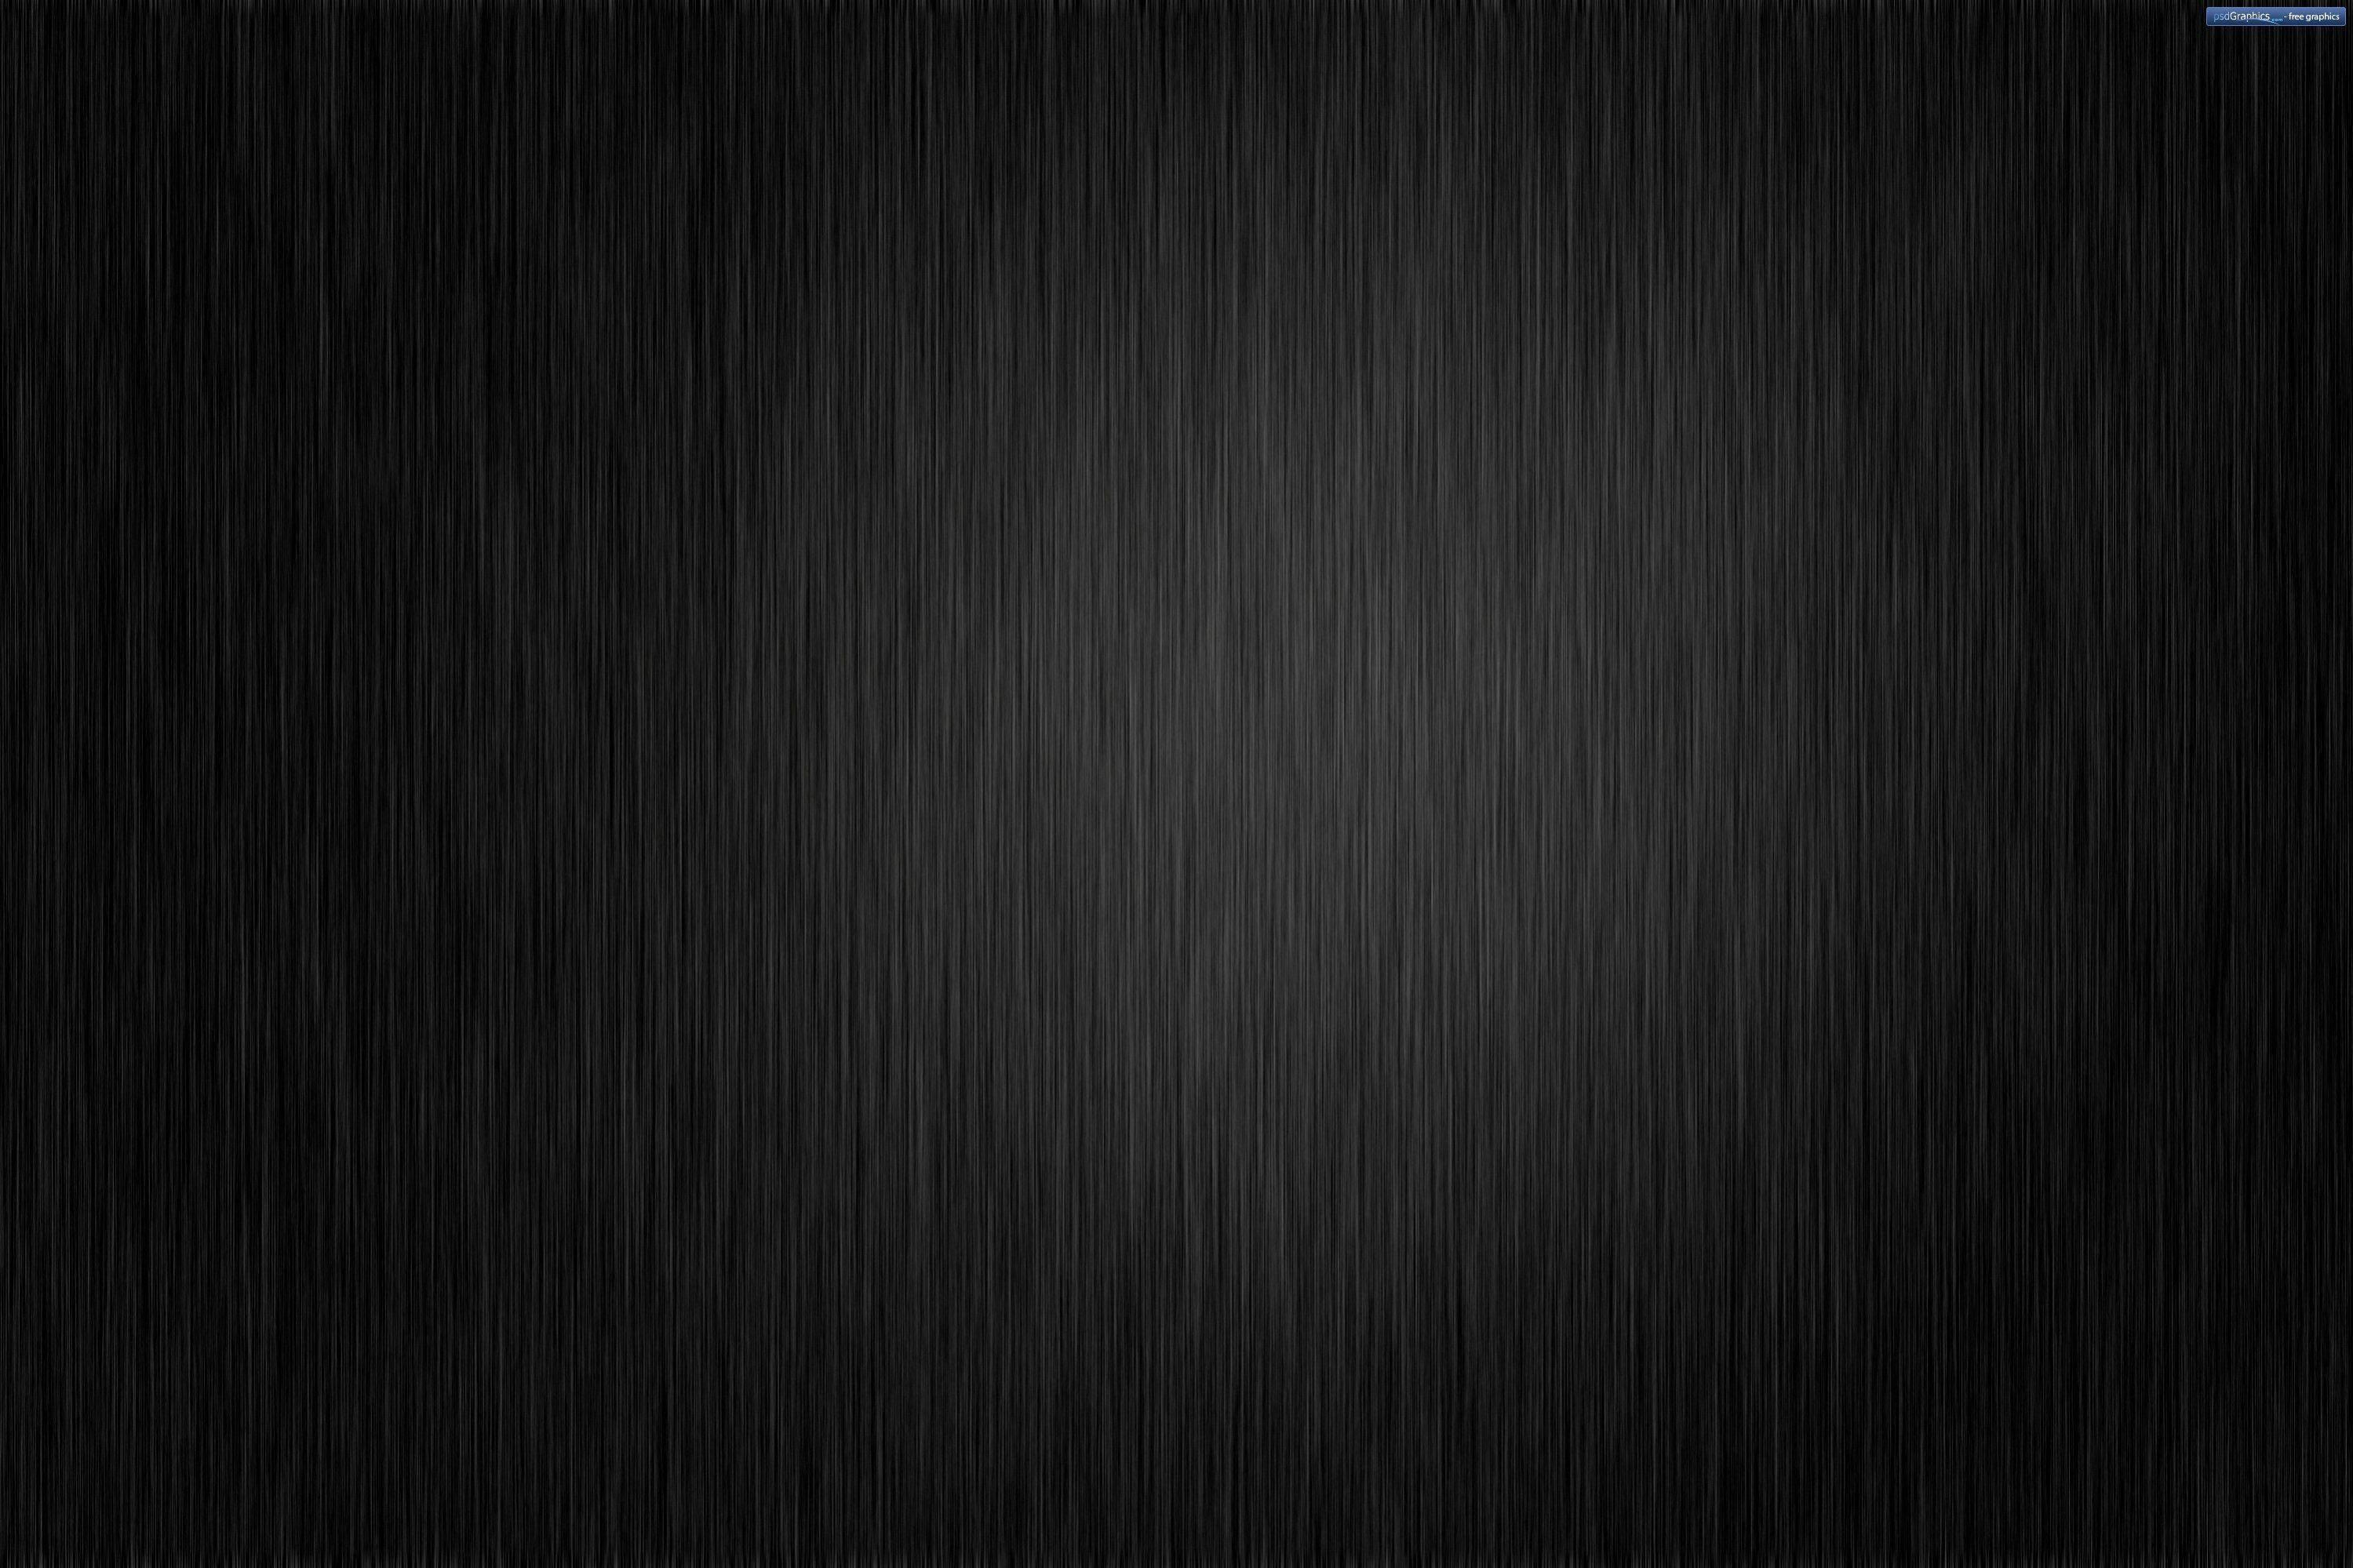 Black Carbon Wallpapers - Wallpaper Cave